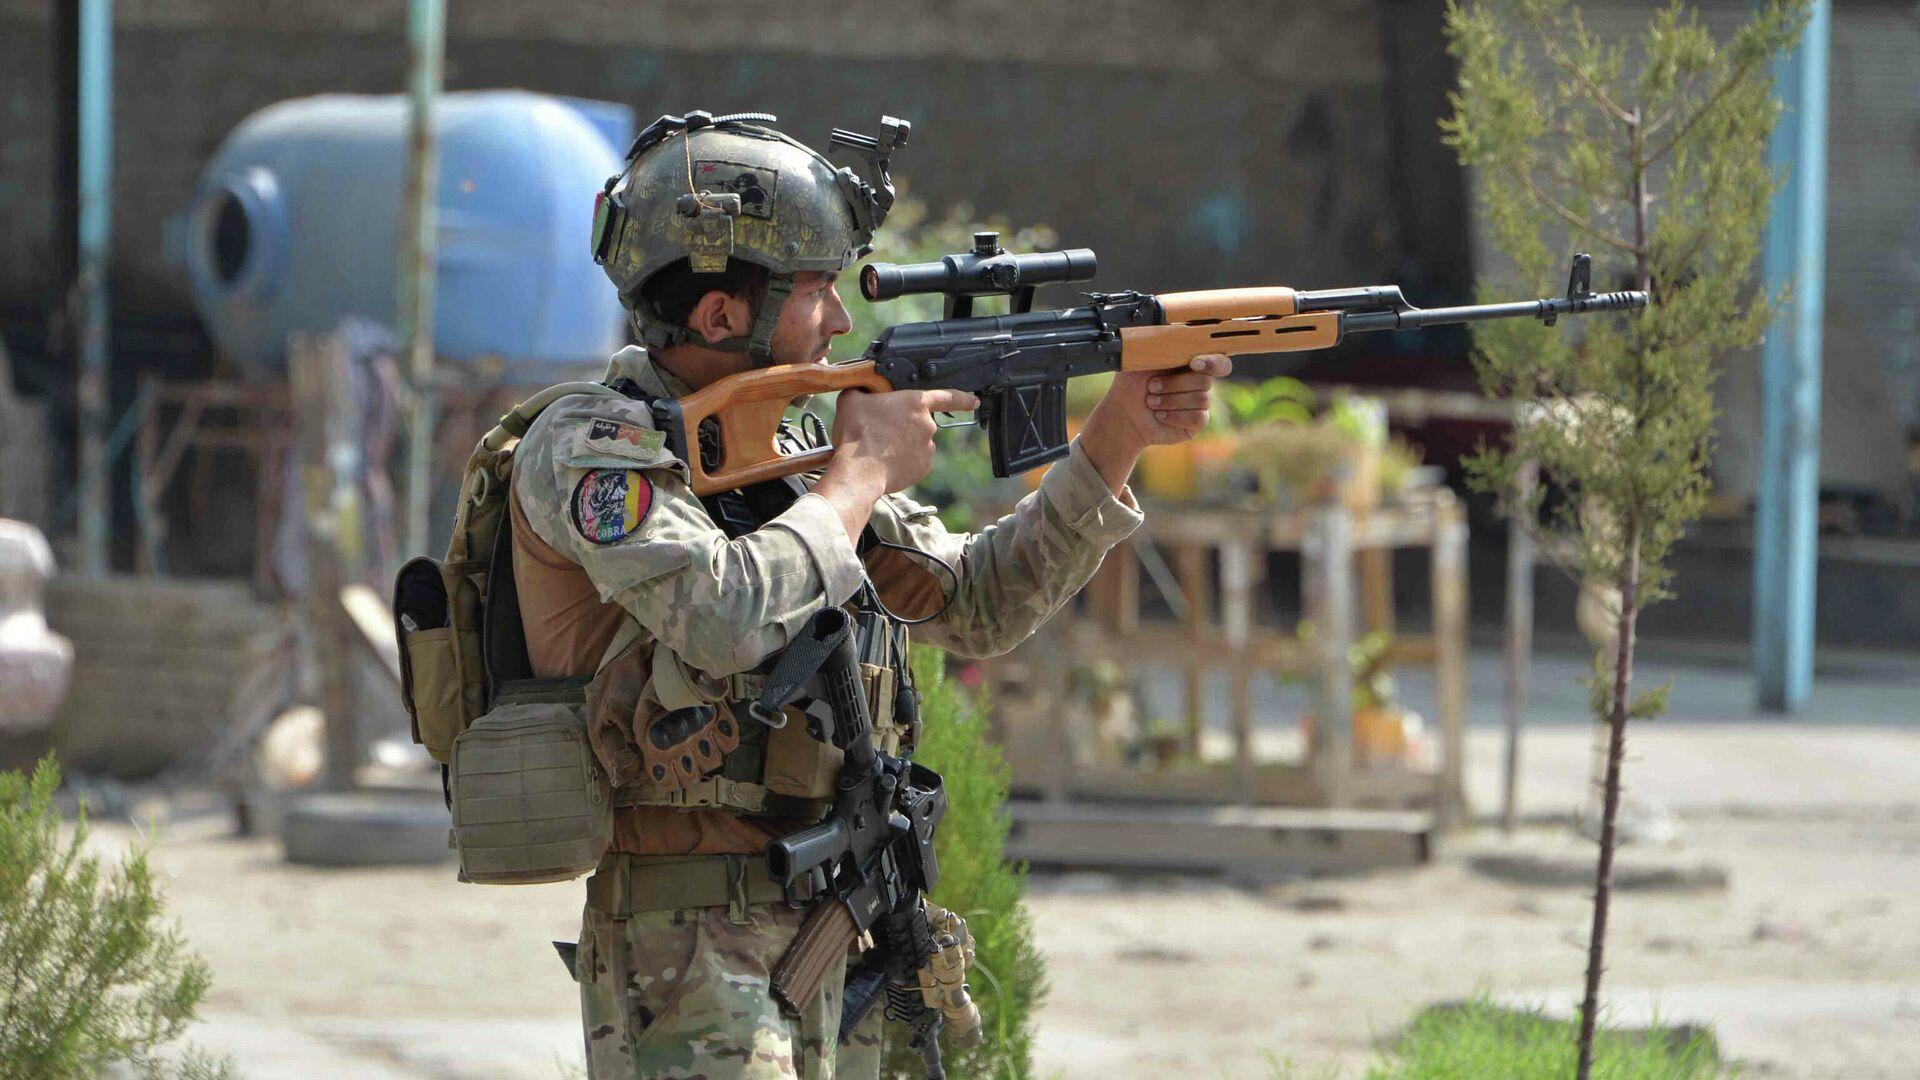 Soldado afgano en Jalalabad, Afganistán - Sputnik Mundo, 1920, 15.02.2021